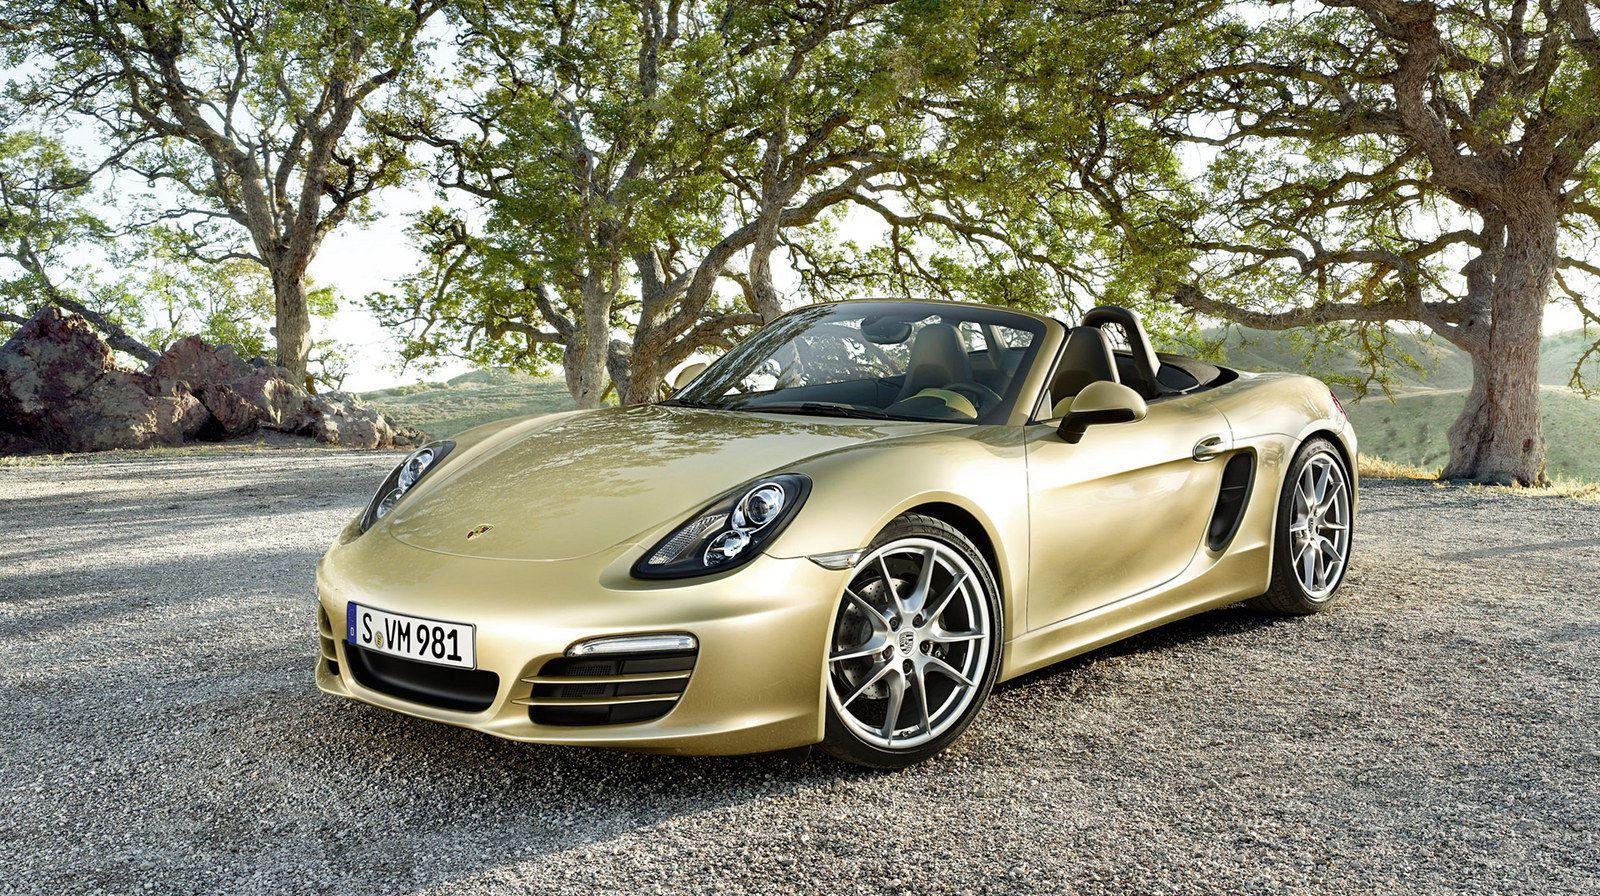 http://static3.therichestimages.com/cdn/1000/560/90/cw/wp-content/uploads/2015/04/Porsche-Boxster-Spyder.jpg